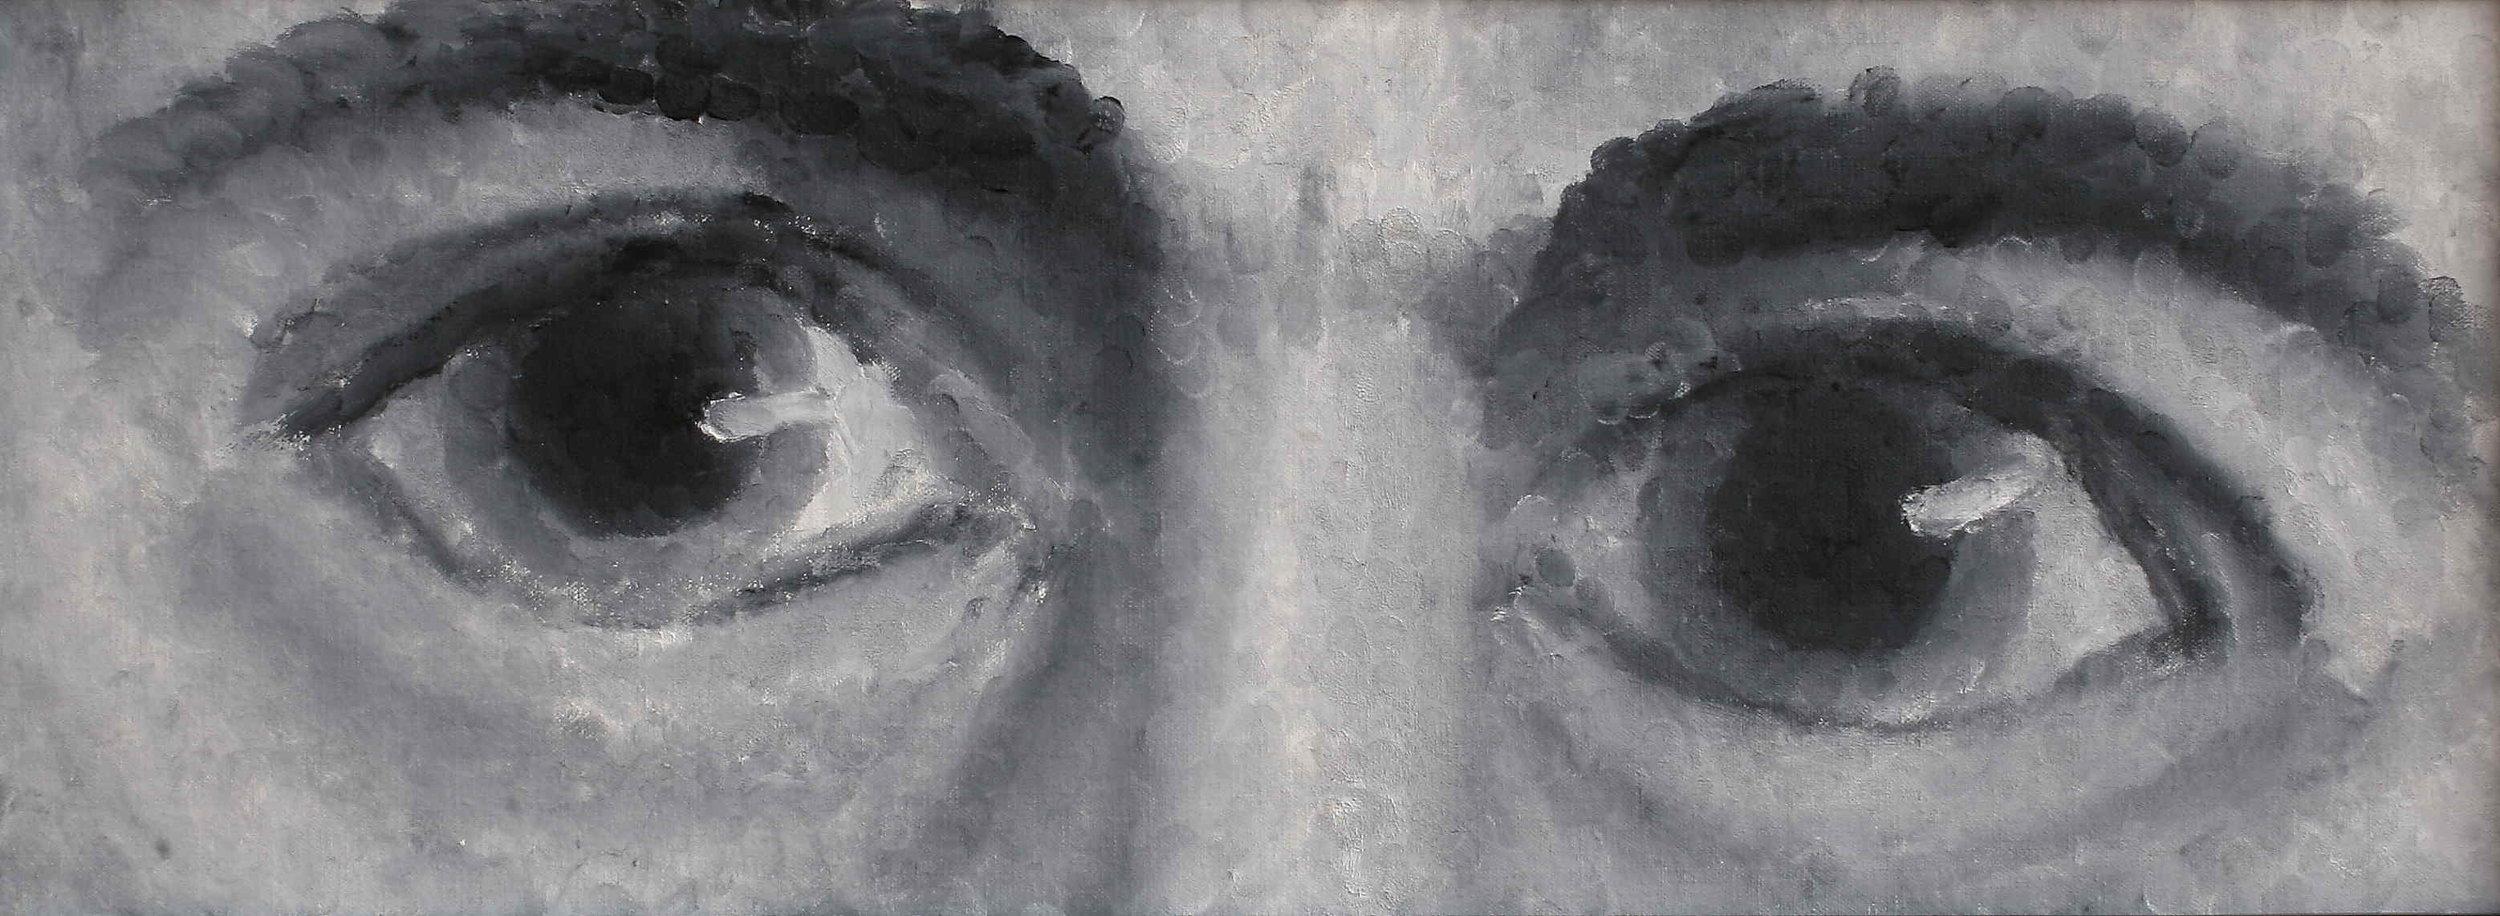 48 Self portrait by a blind man.JPG